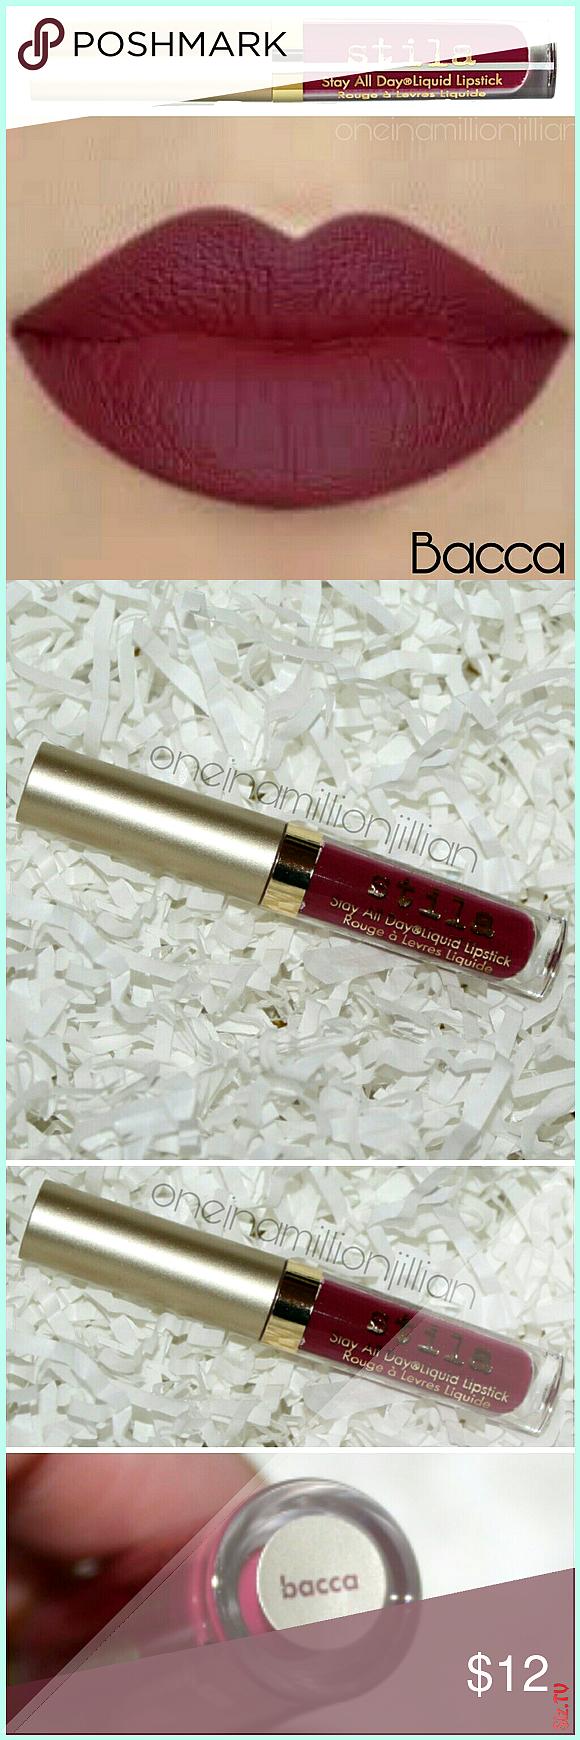 Stila Stay all Day Liquid Lipstick  Bacca New Never Used Authentic 05oz Travel Sz fs  08oz 22  Colo